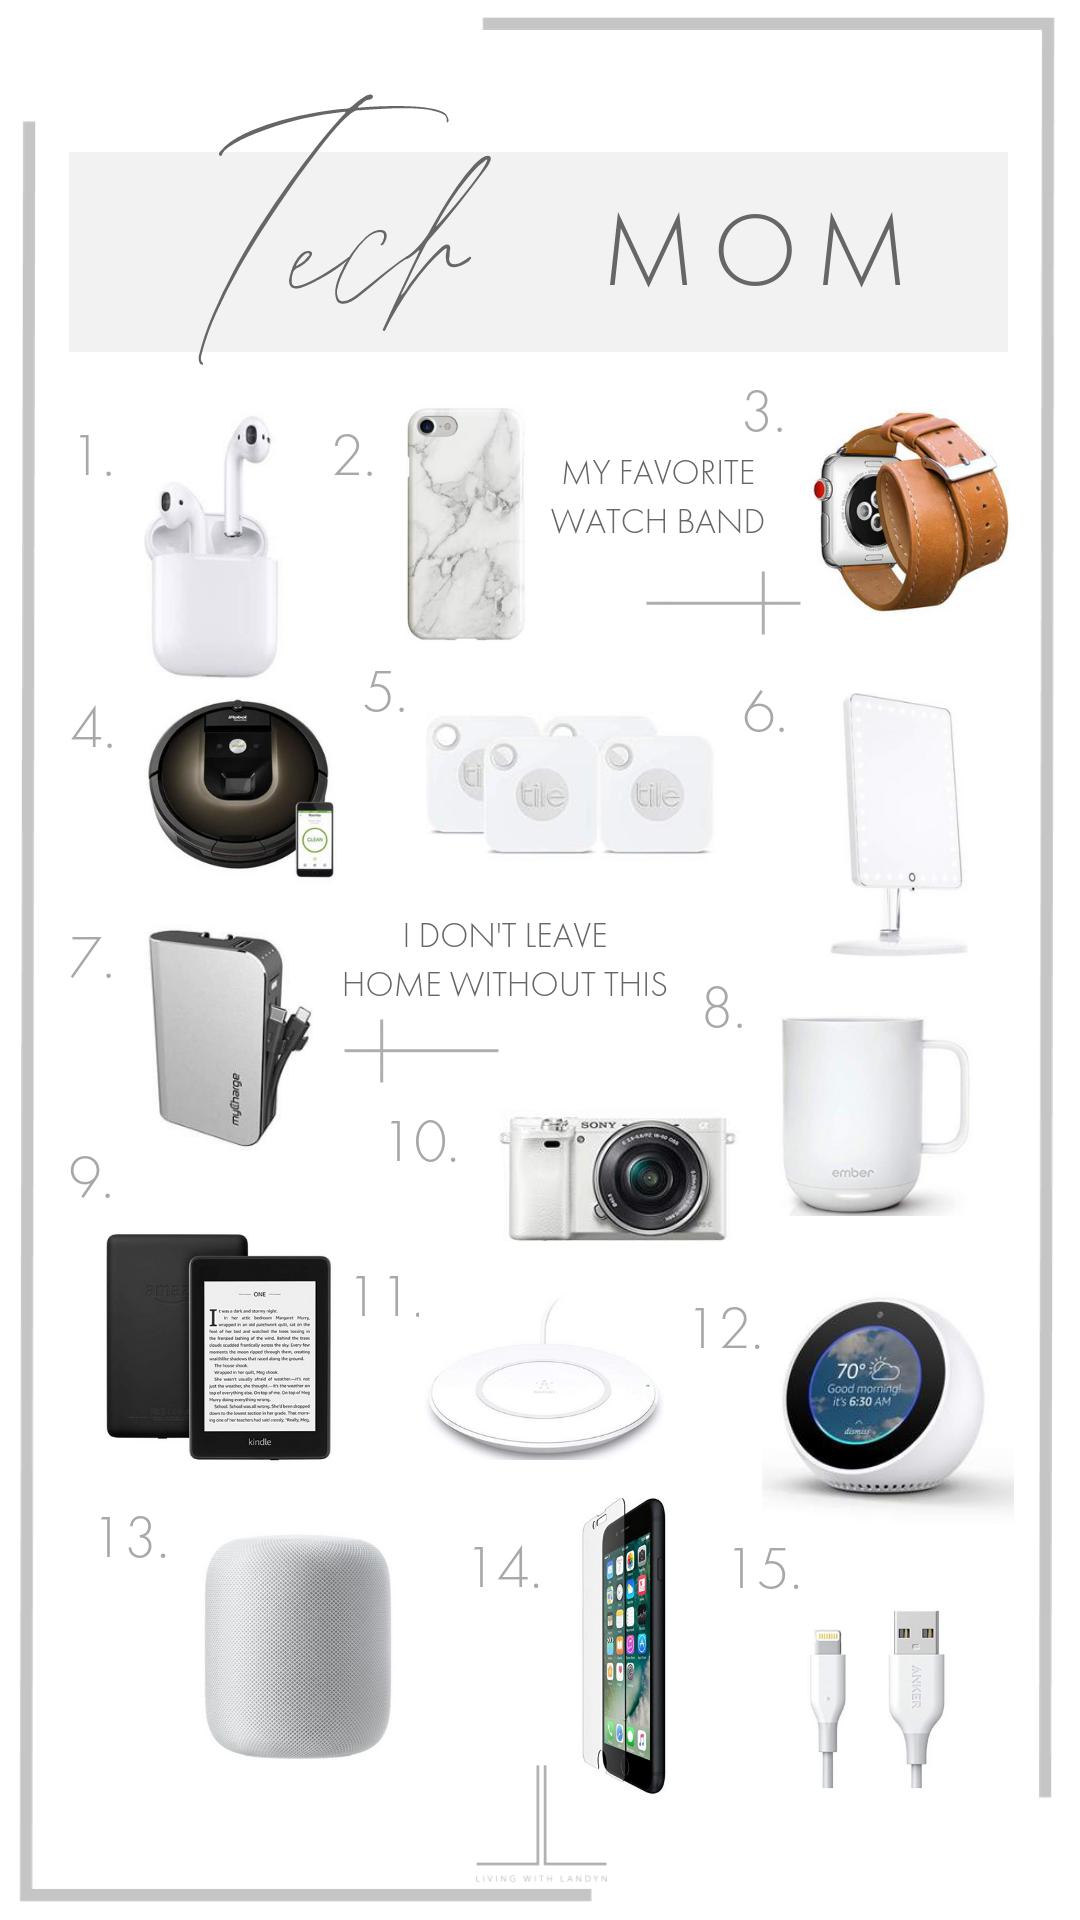 Tech Mom Gift Guide Gift Guide Tech Cool Tech Gifts Holiday Tech Gifts